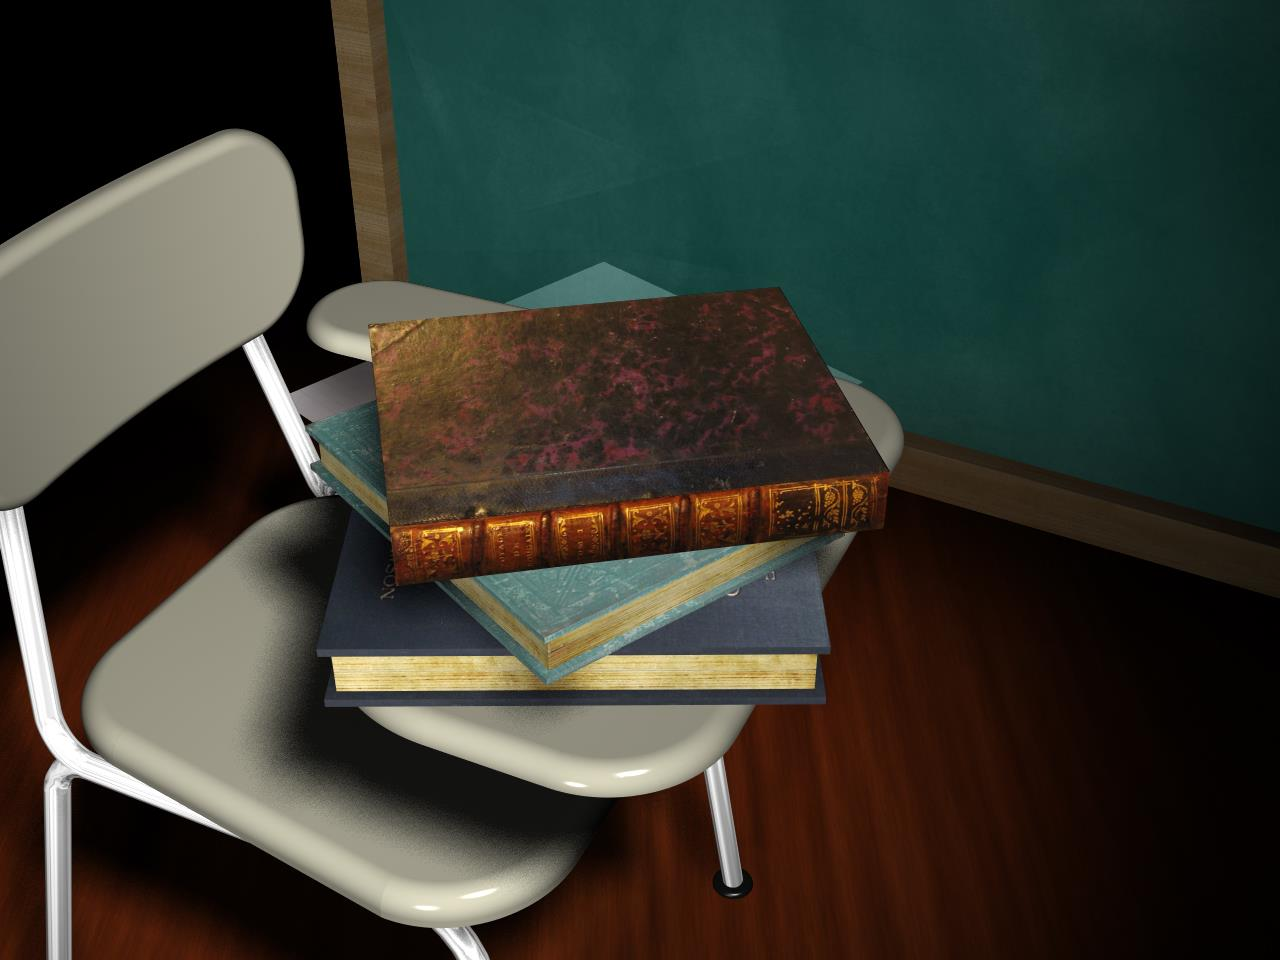 mgn-school-books_312767